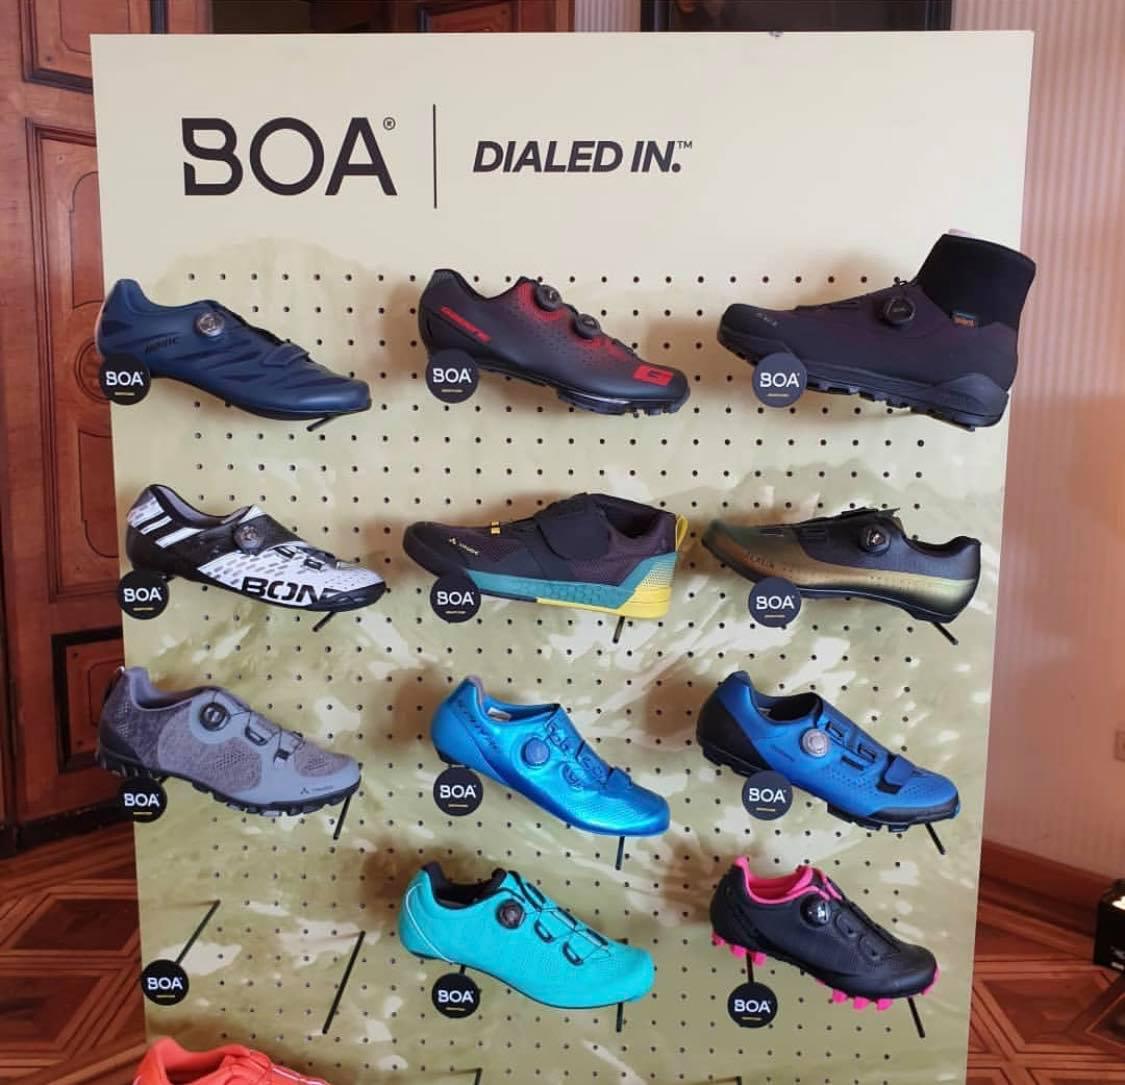 Le stand Boa à Eurobike